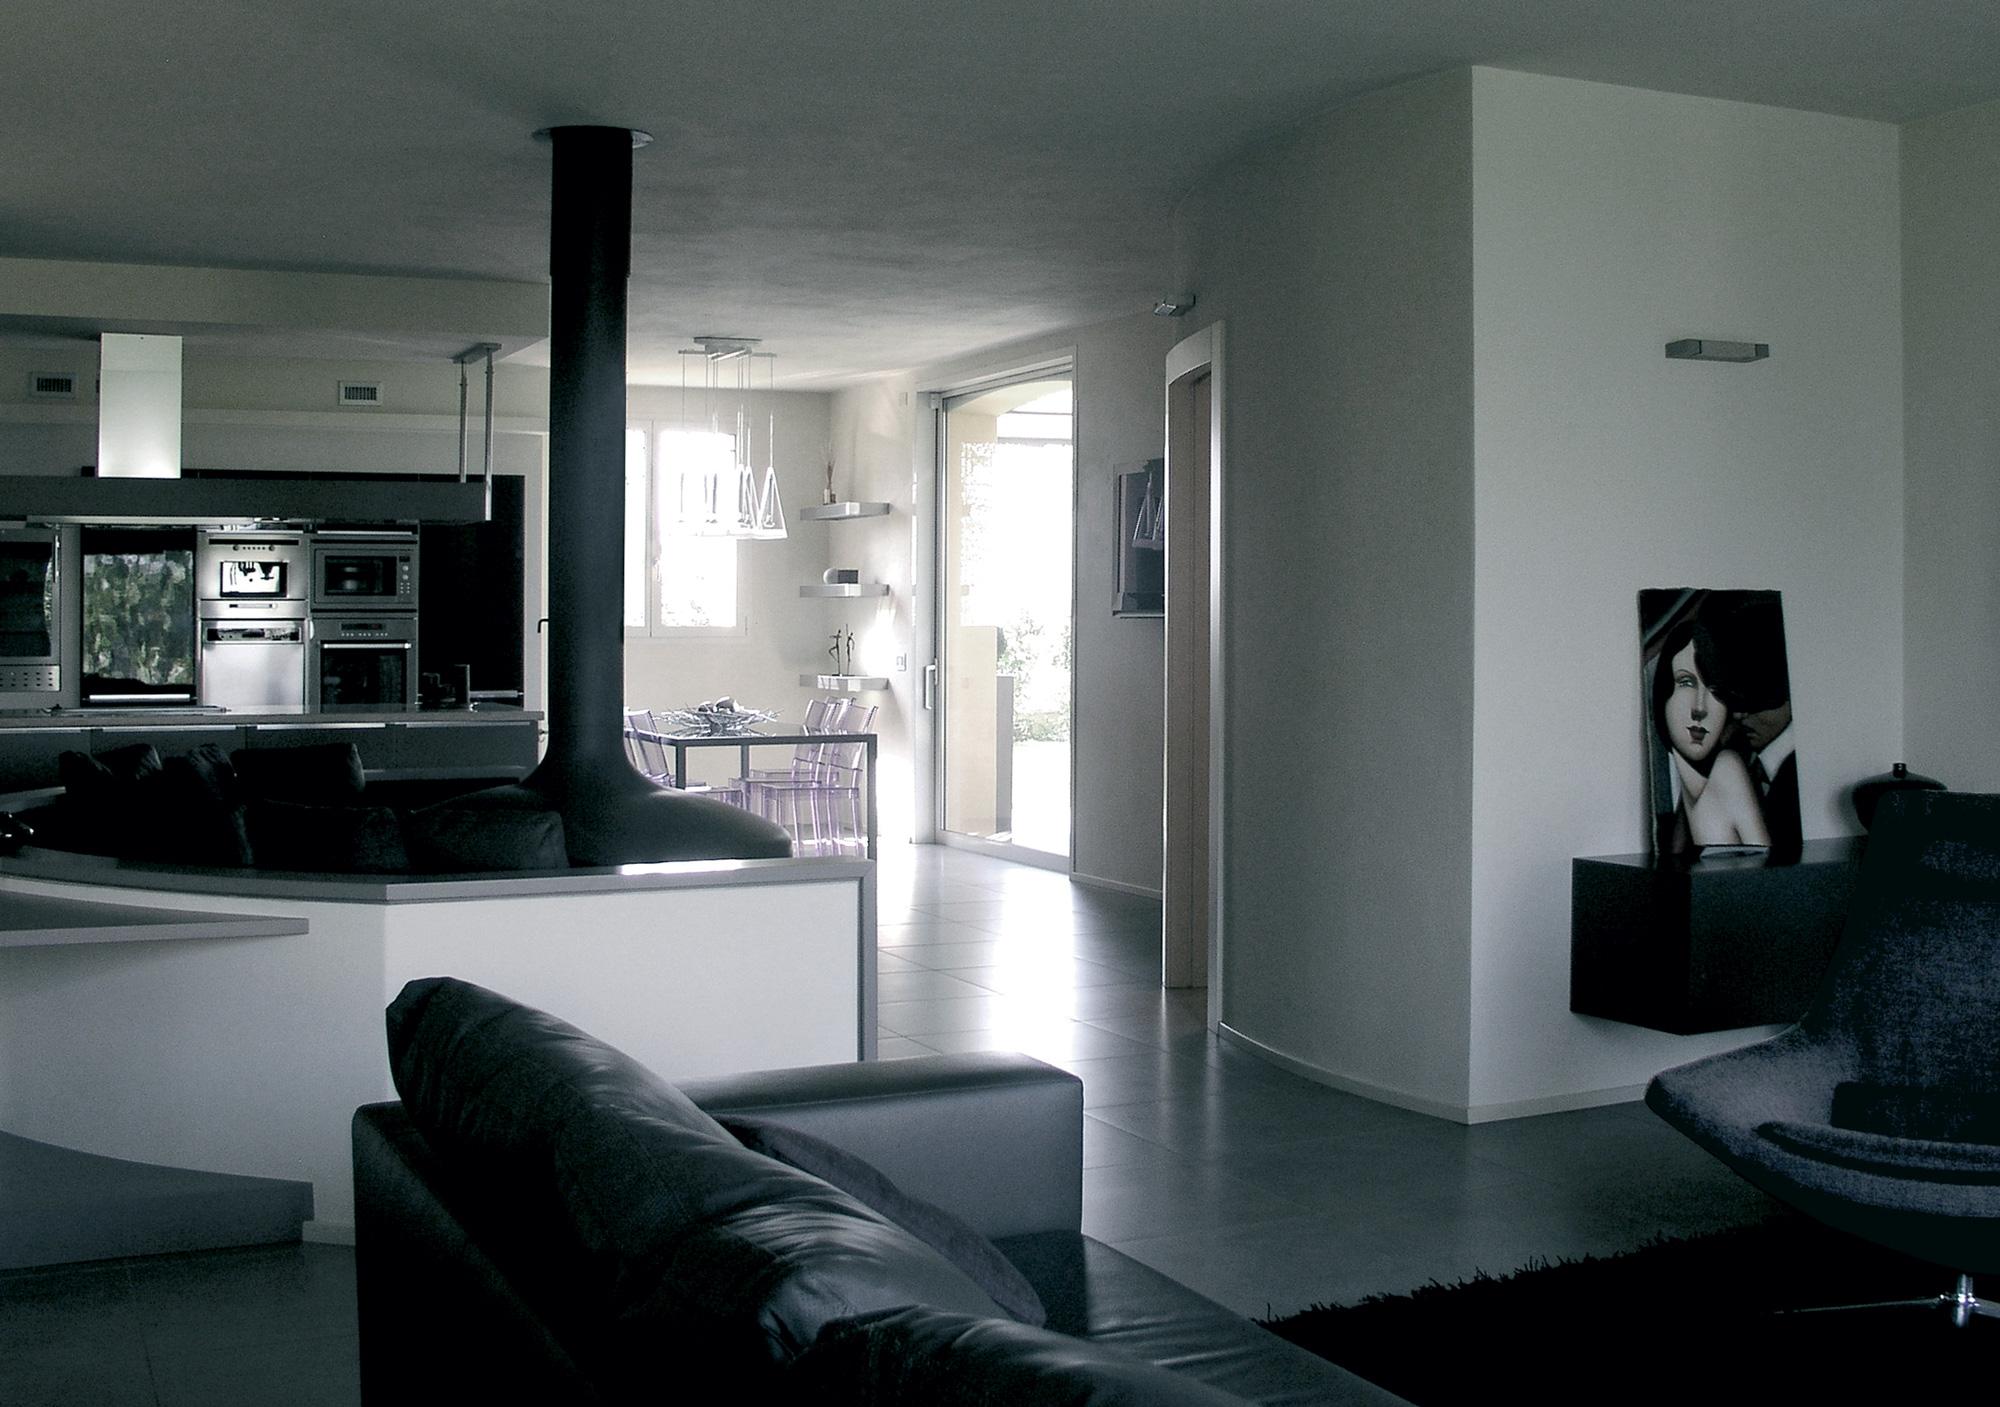 countryhouse renovation uainot. Black Bedroom Furniture Sets. Home Design Ideas